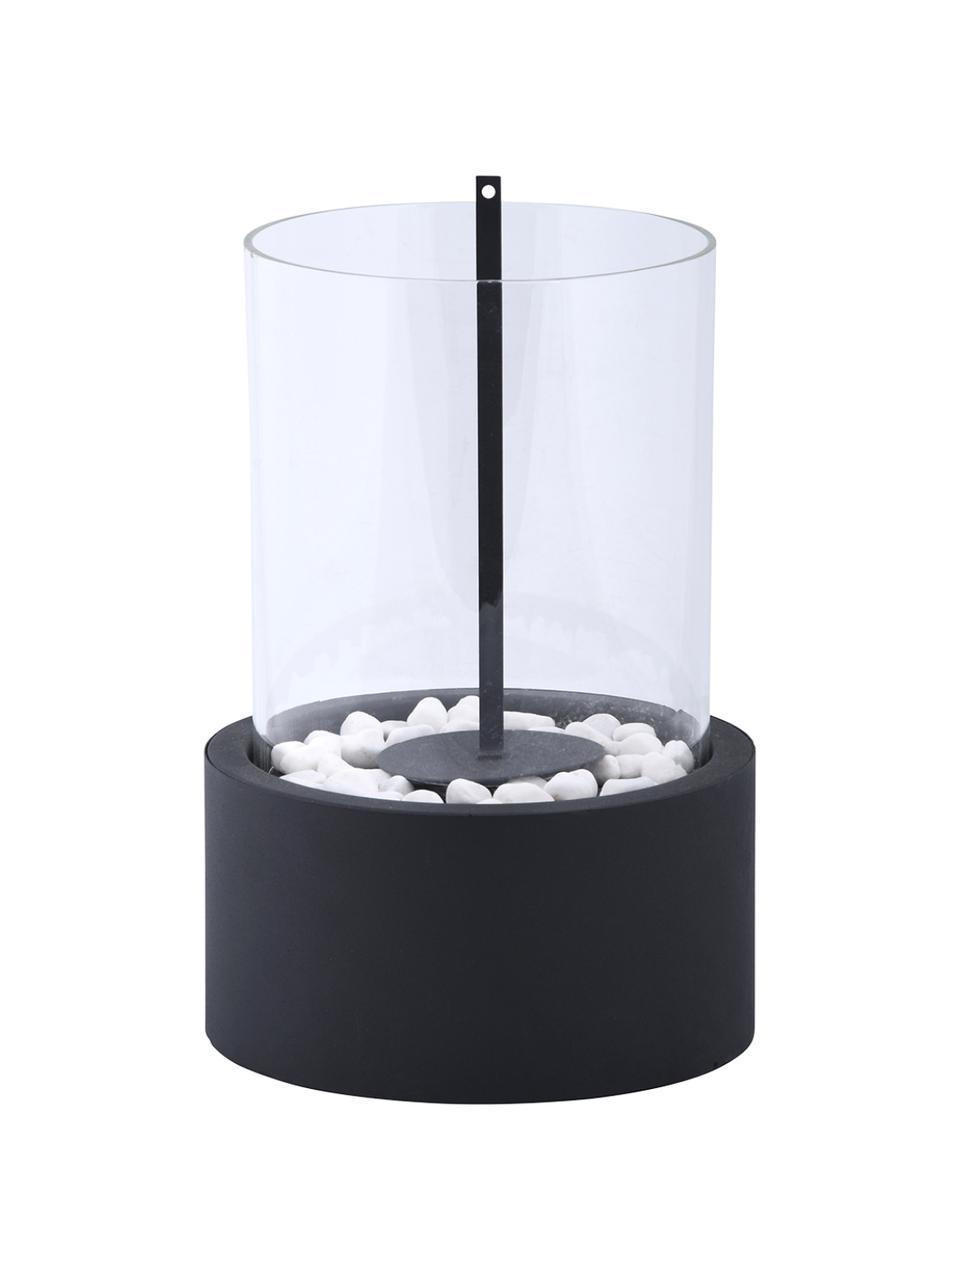 Bioethanol-Tischkamin Damin, Sockel: Metall, beschichtet, Schwarz, Transparent, Ø 19 x H 27 cm